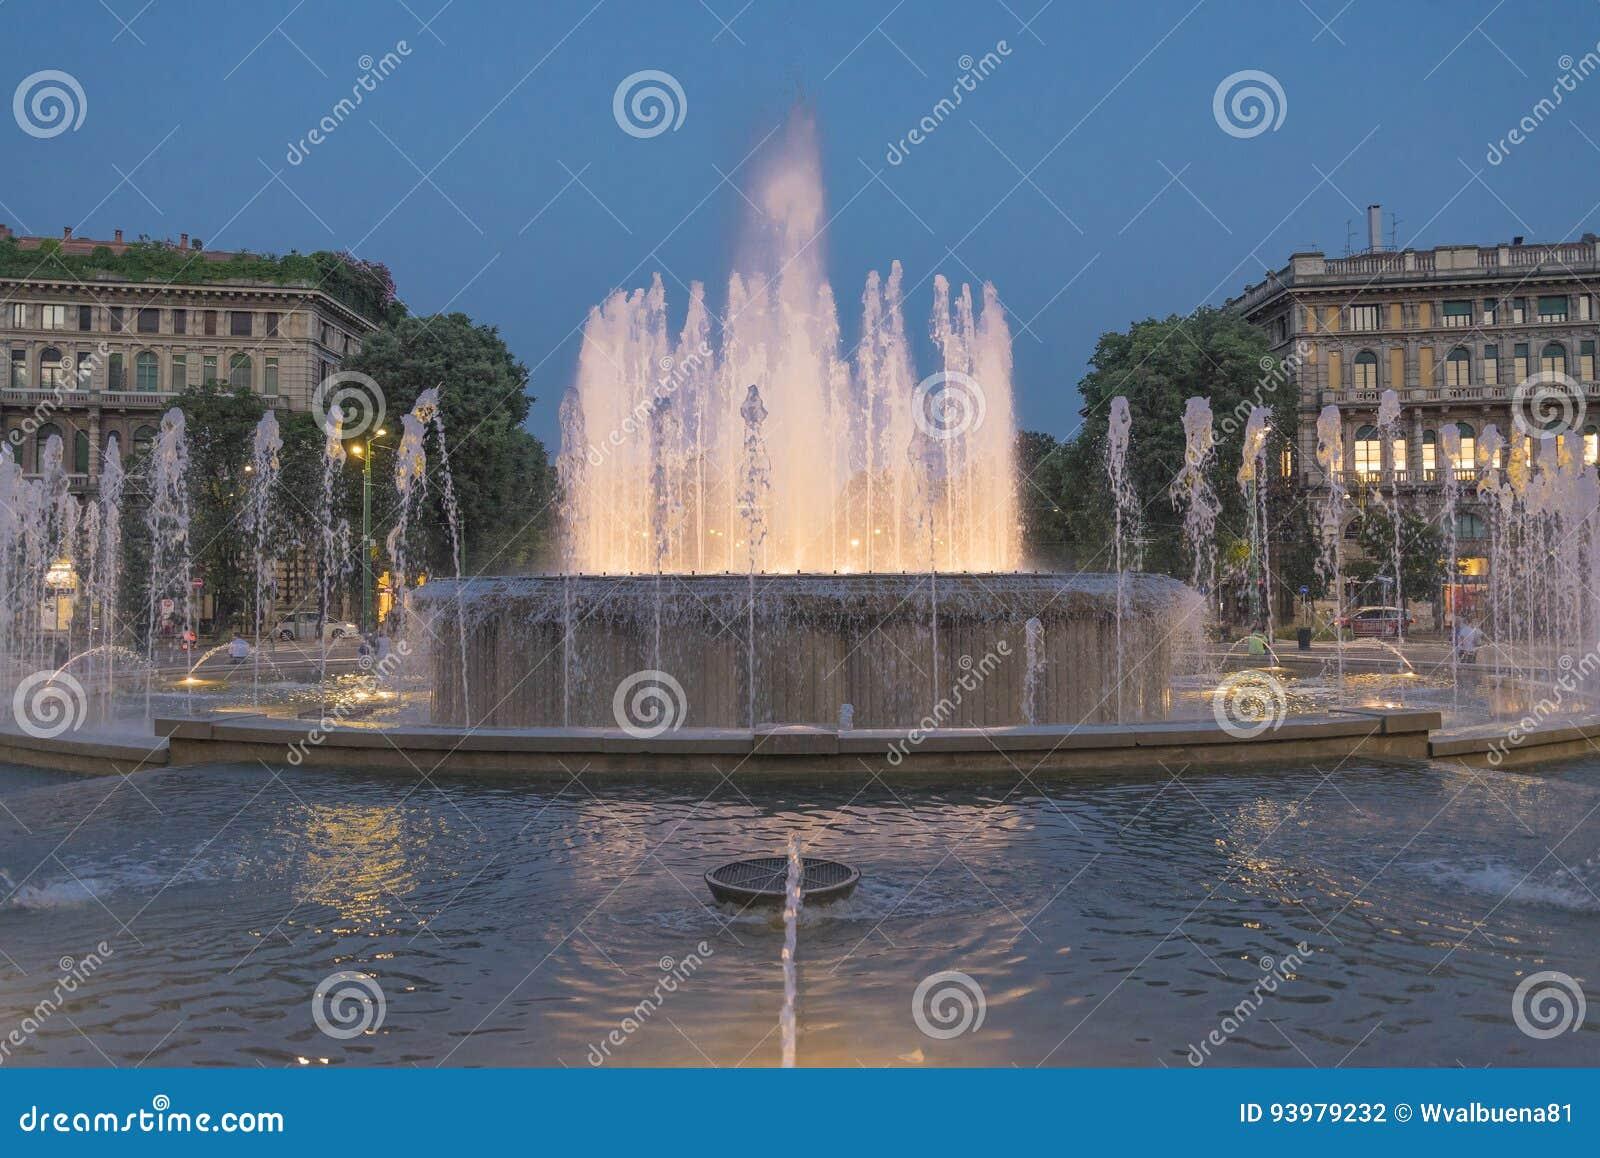 Fontana illuminata nella sera